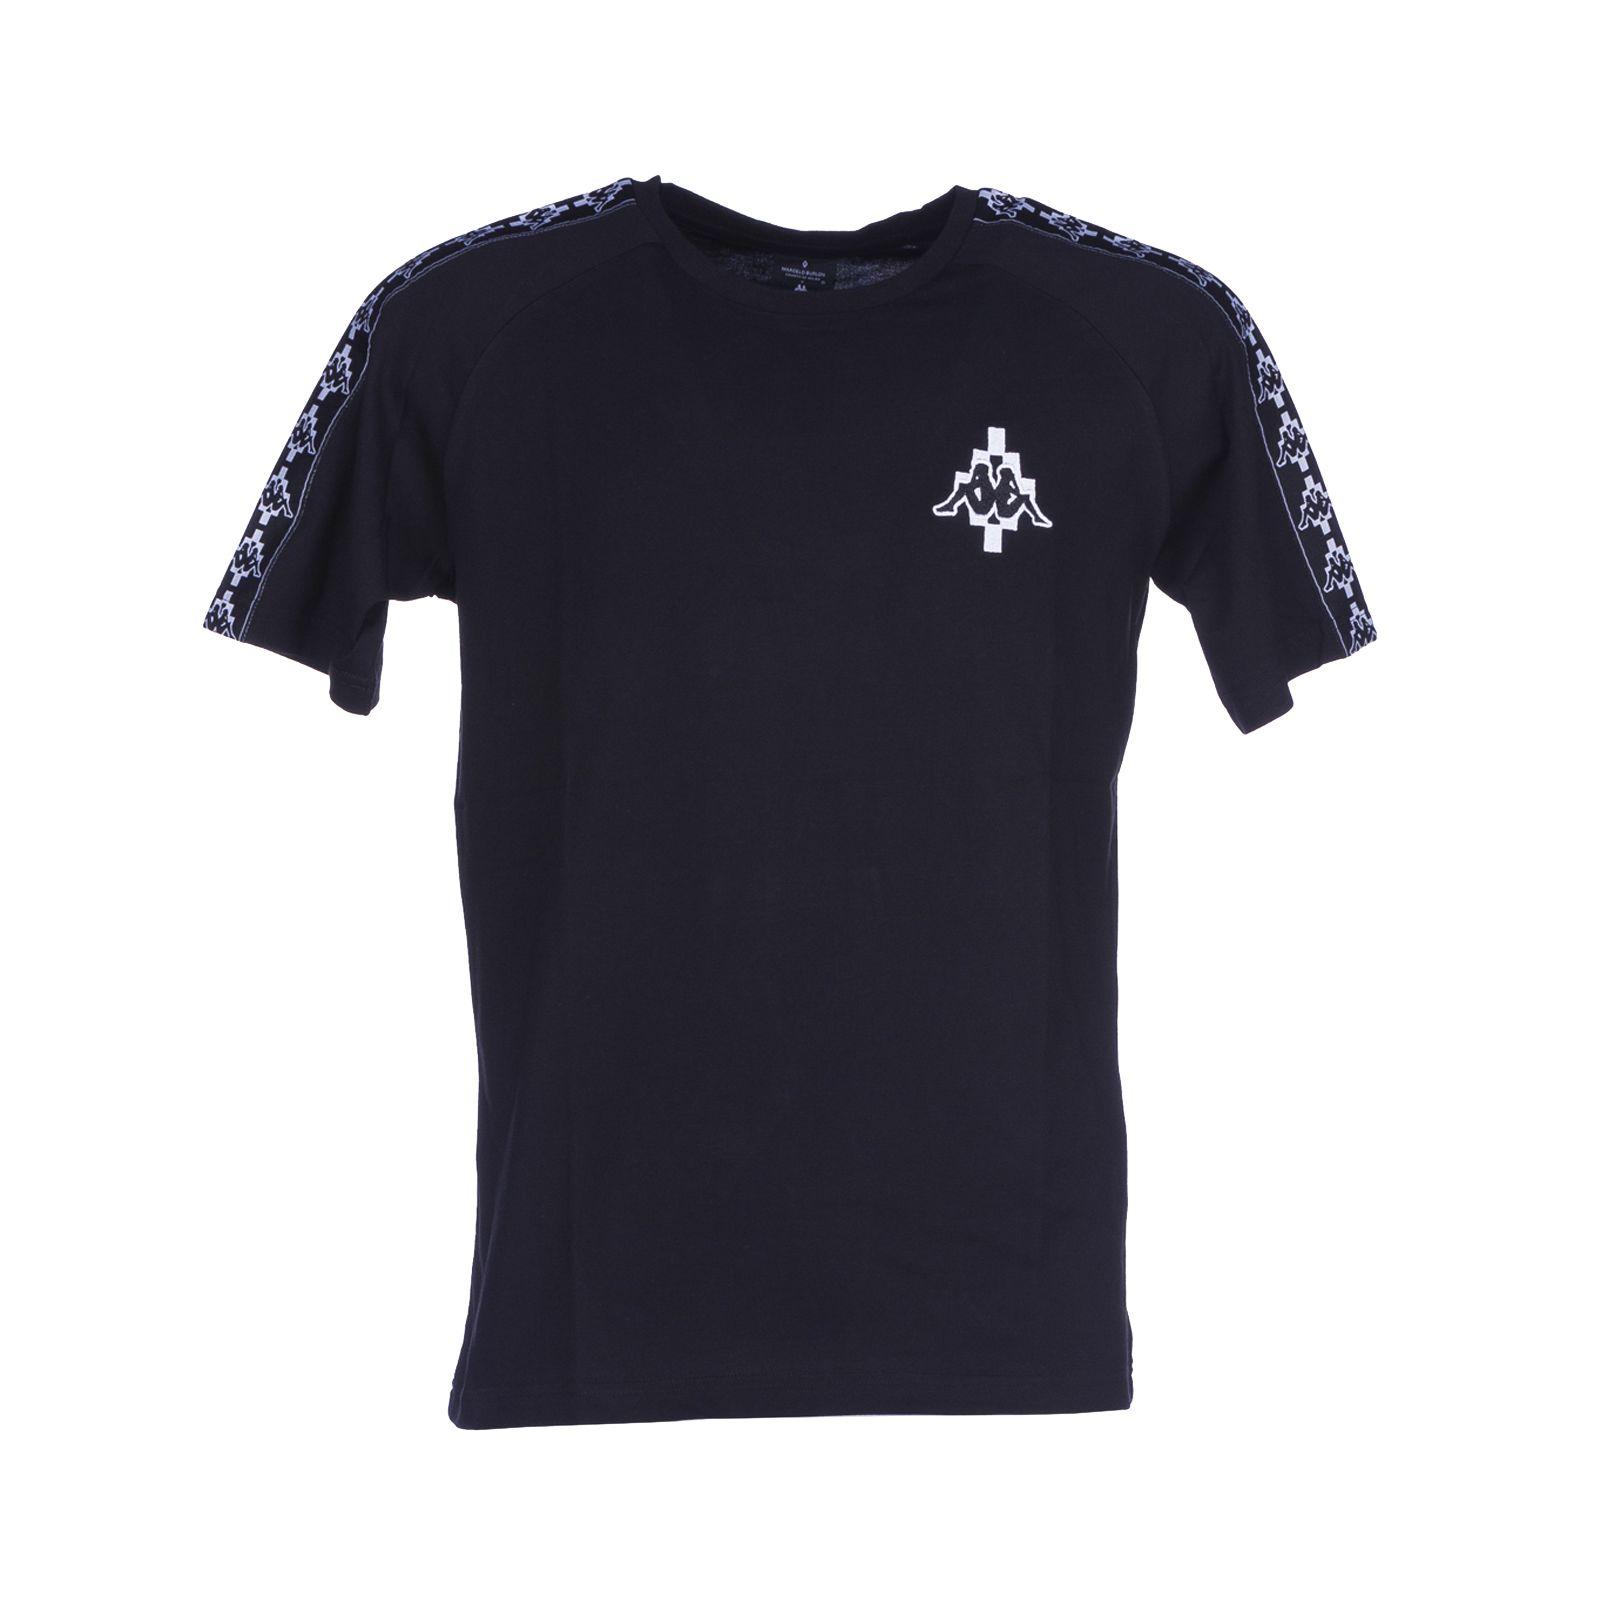 Kappa By Marcelo Burlon Kappa T-shirt